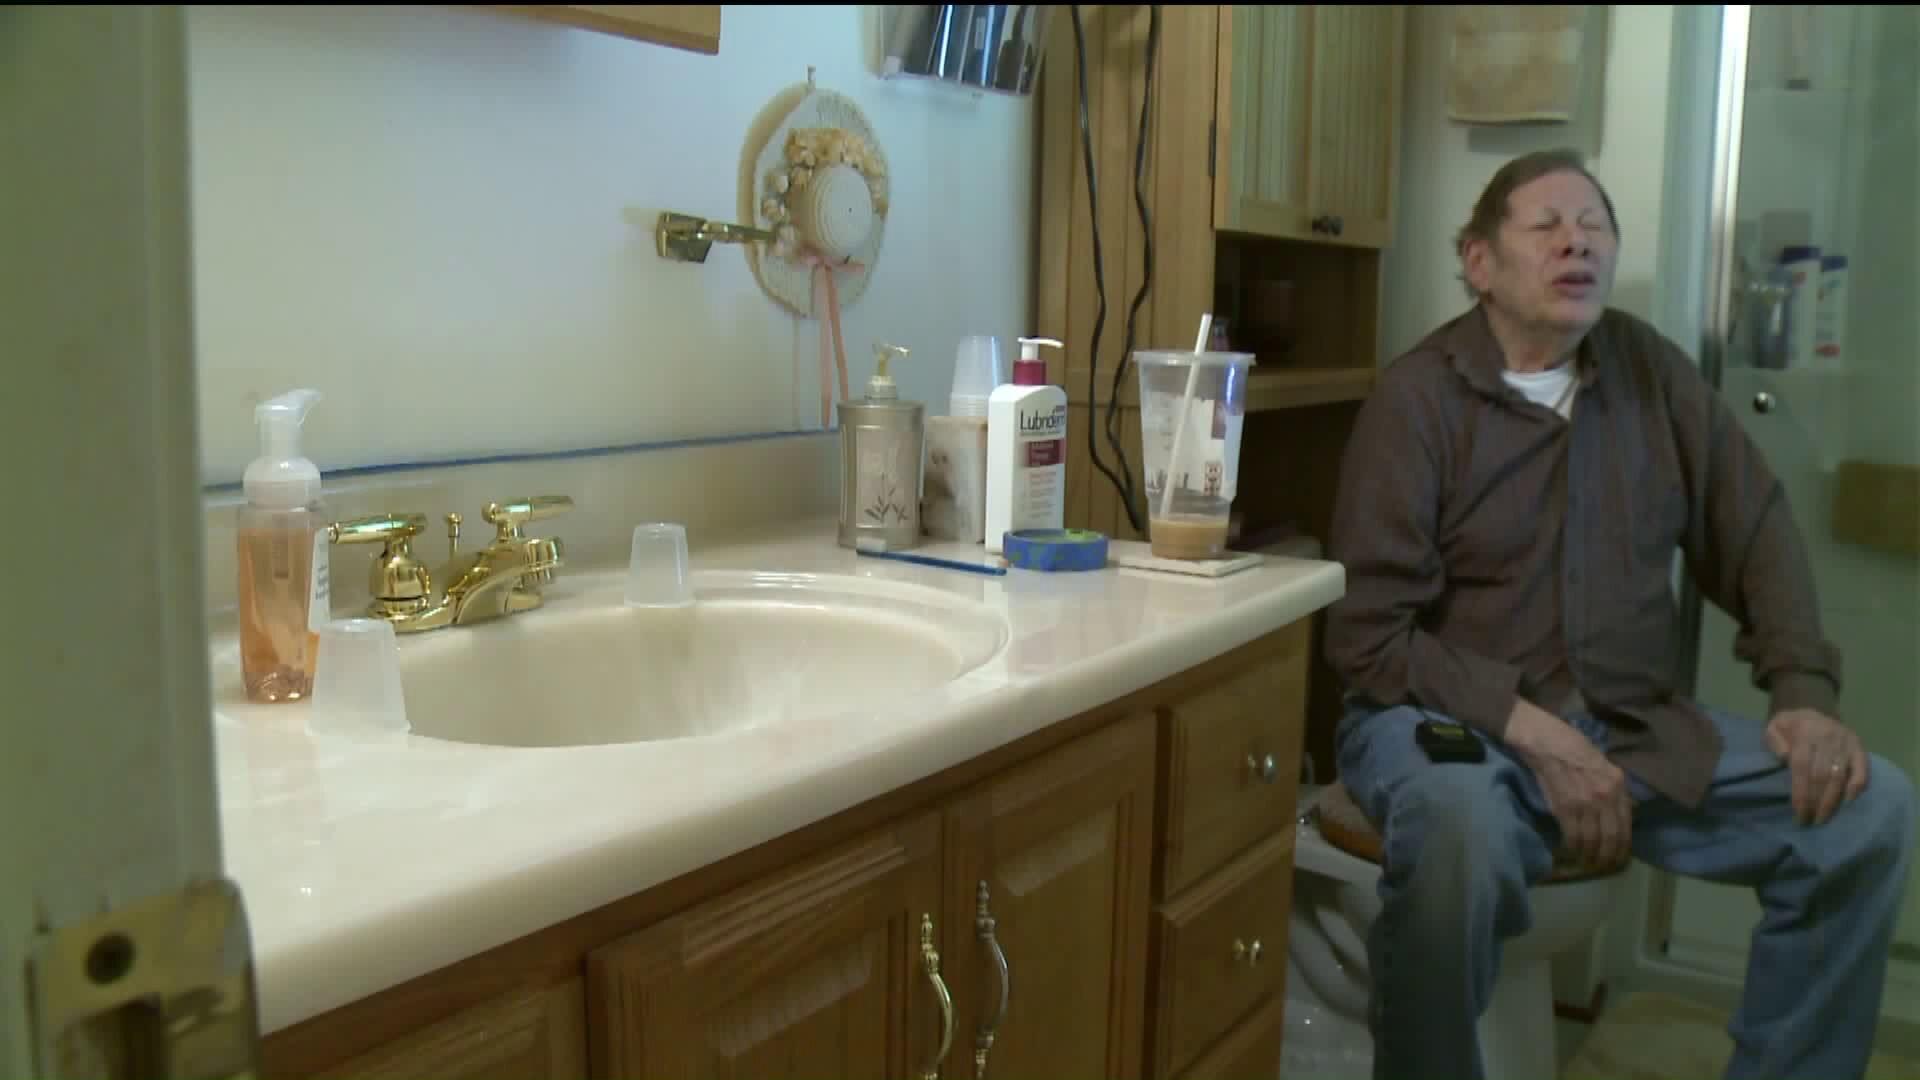 Photos: Midlothian man sees Donald Trump in bathroom floortile